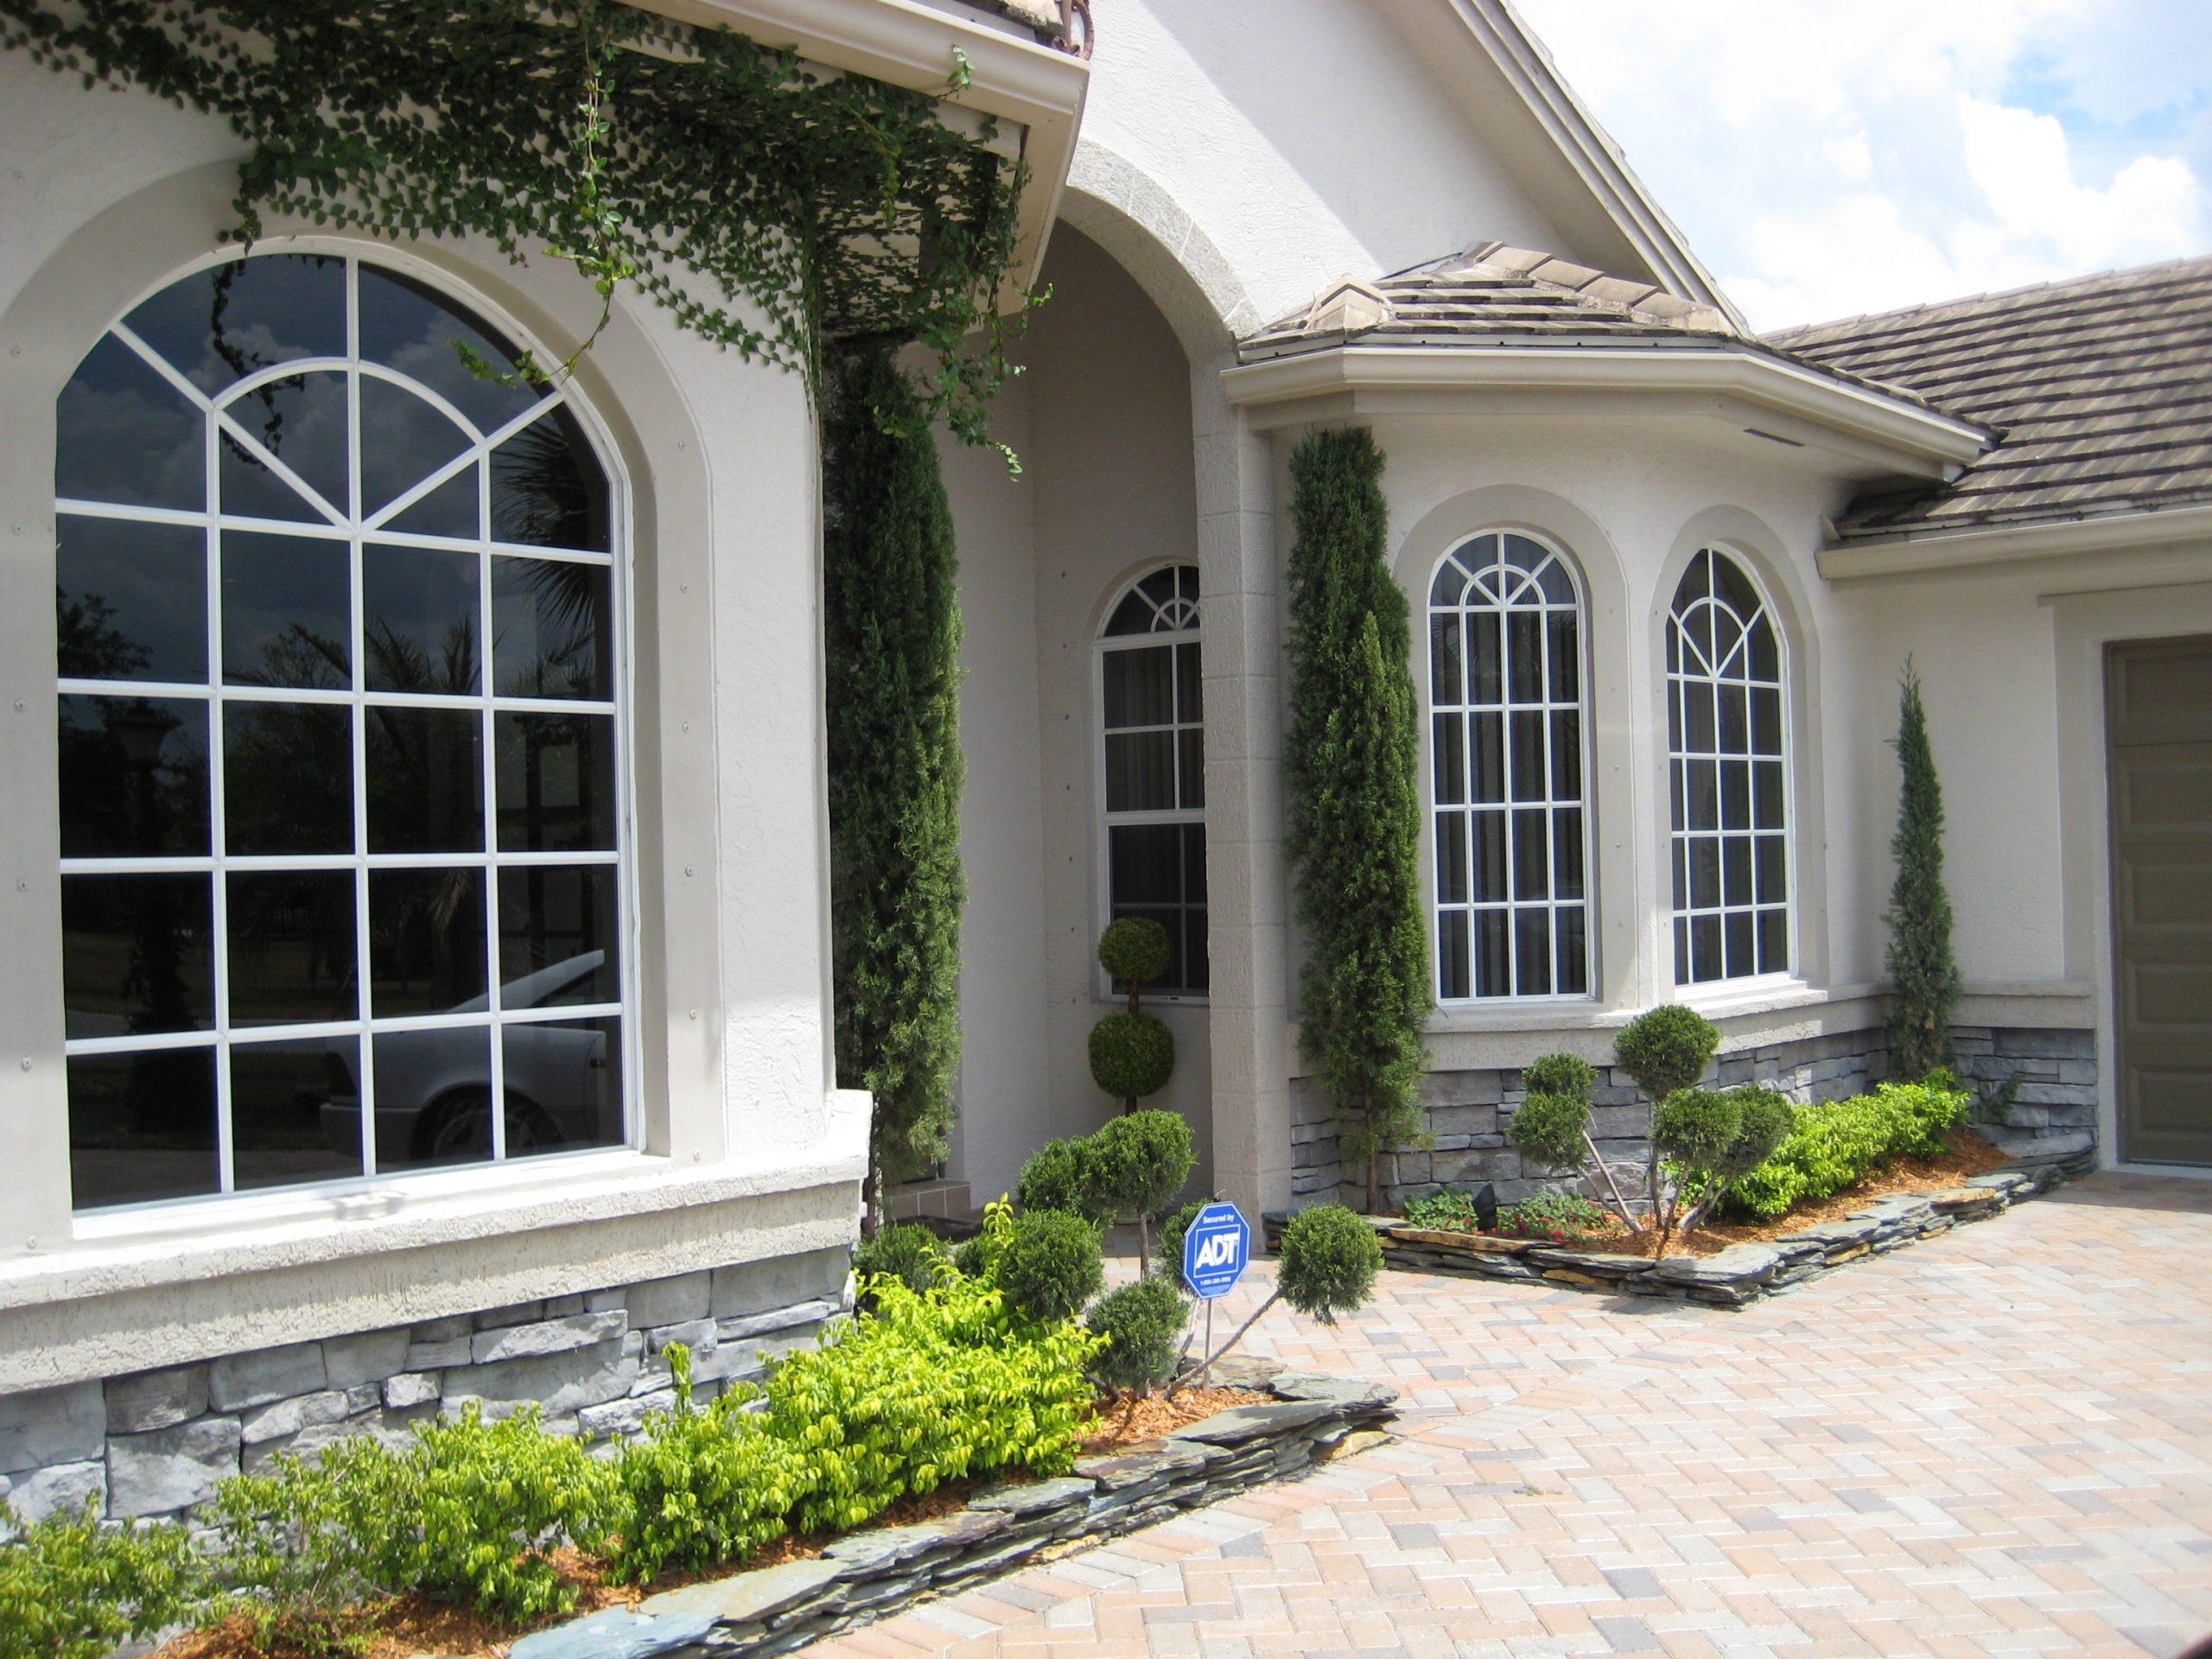 best windows design house Home Design View Best Windows Design House Pics